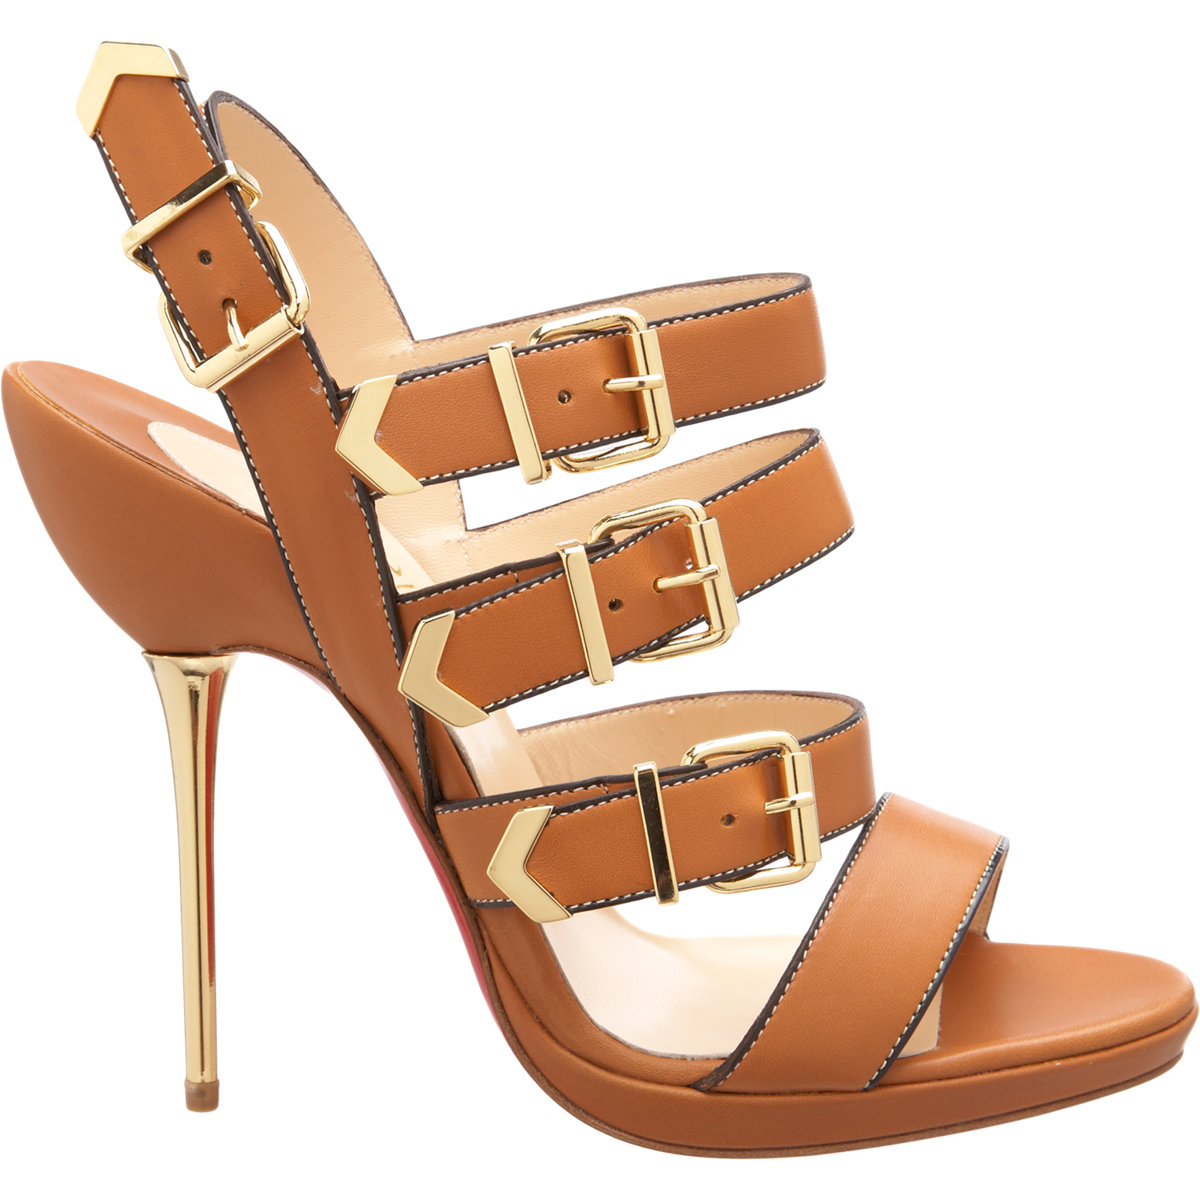 Christian Louboutin Funky 120 Platform Sandals